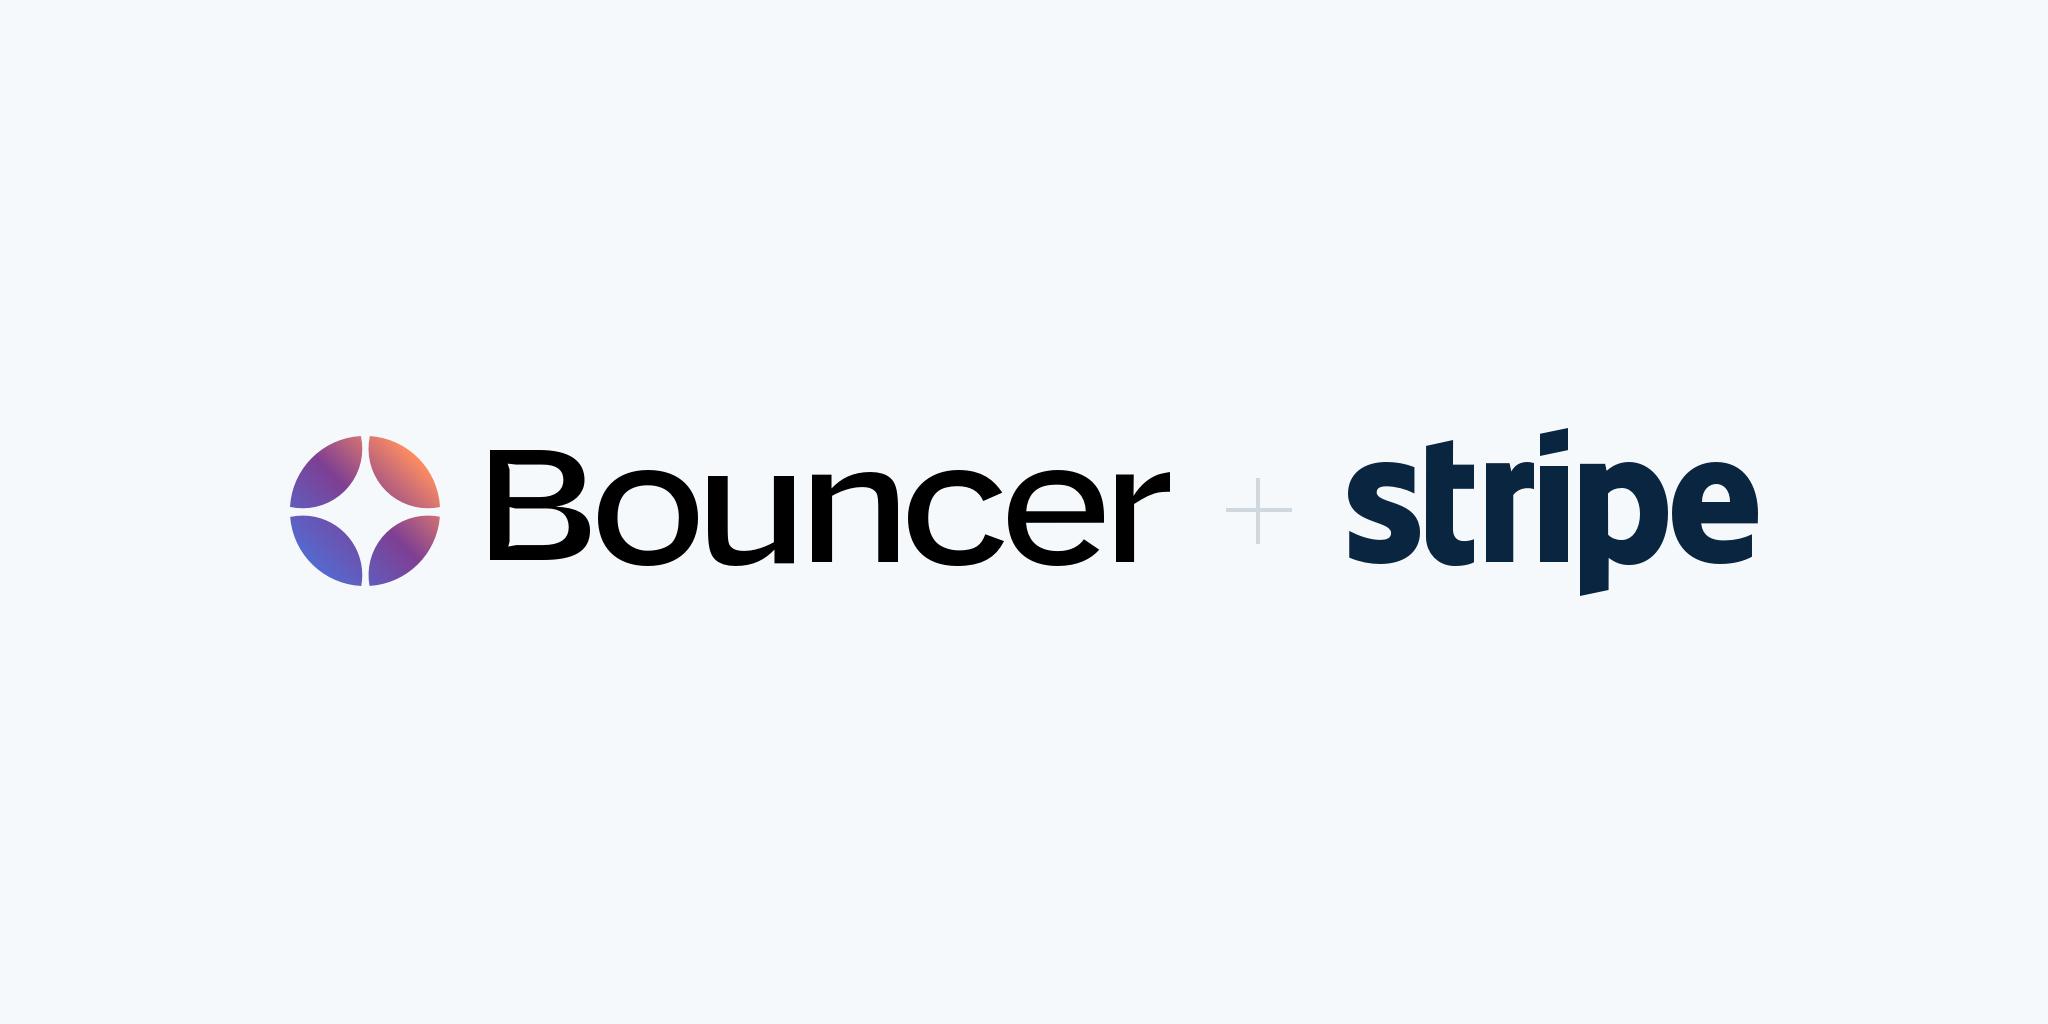 Stripe acquires Bouncer